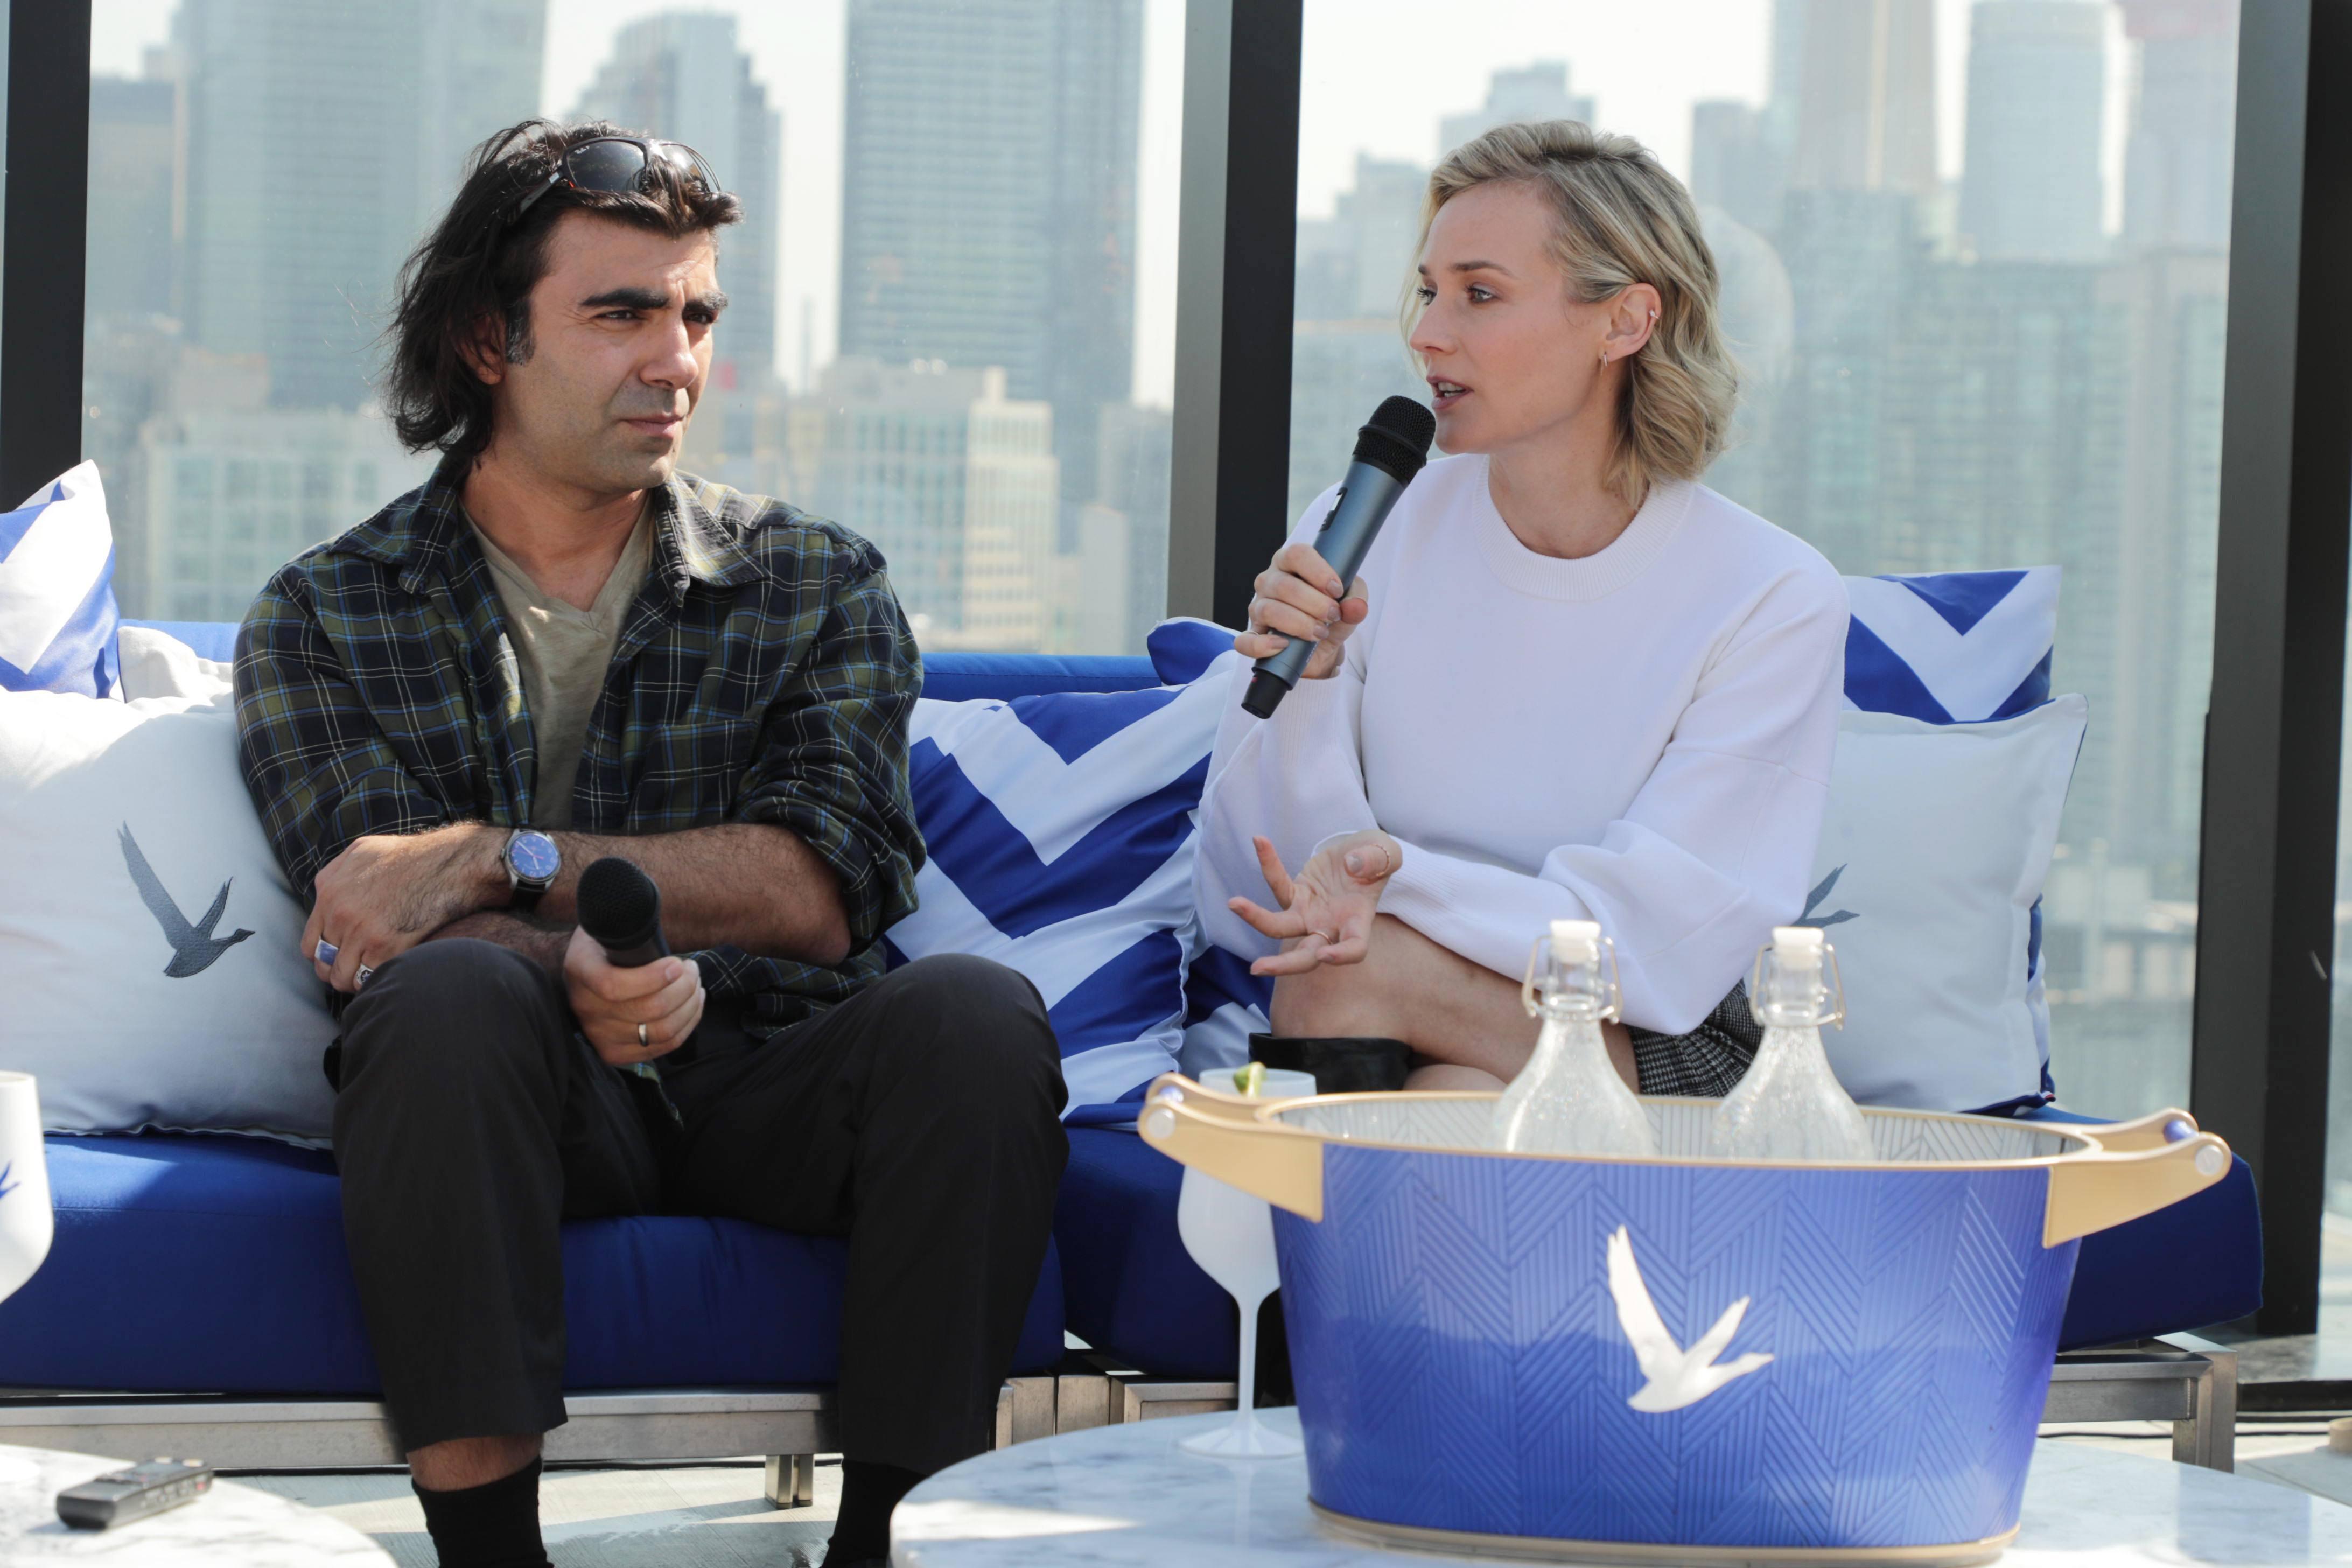 TIFF 2017 Celebrities Fatih Akin, Writer/Director/Producer, and Diane Kruger